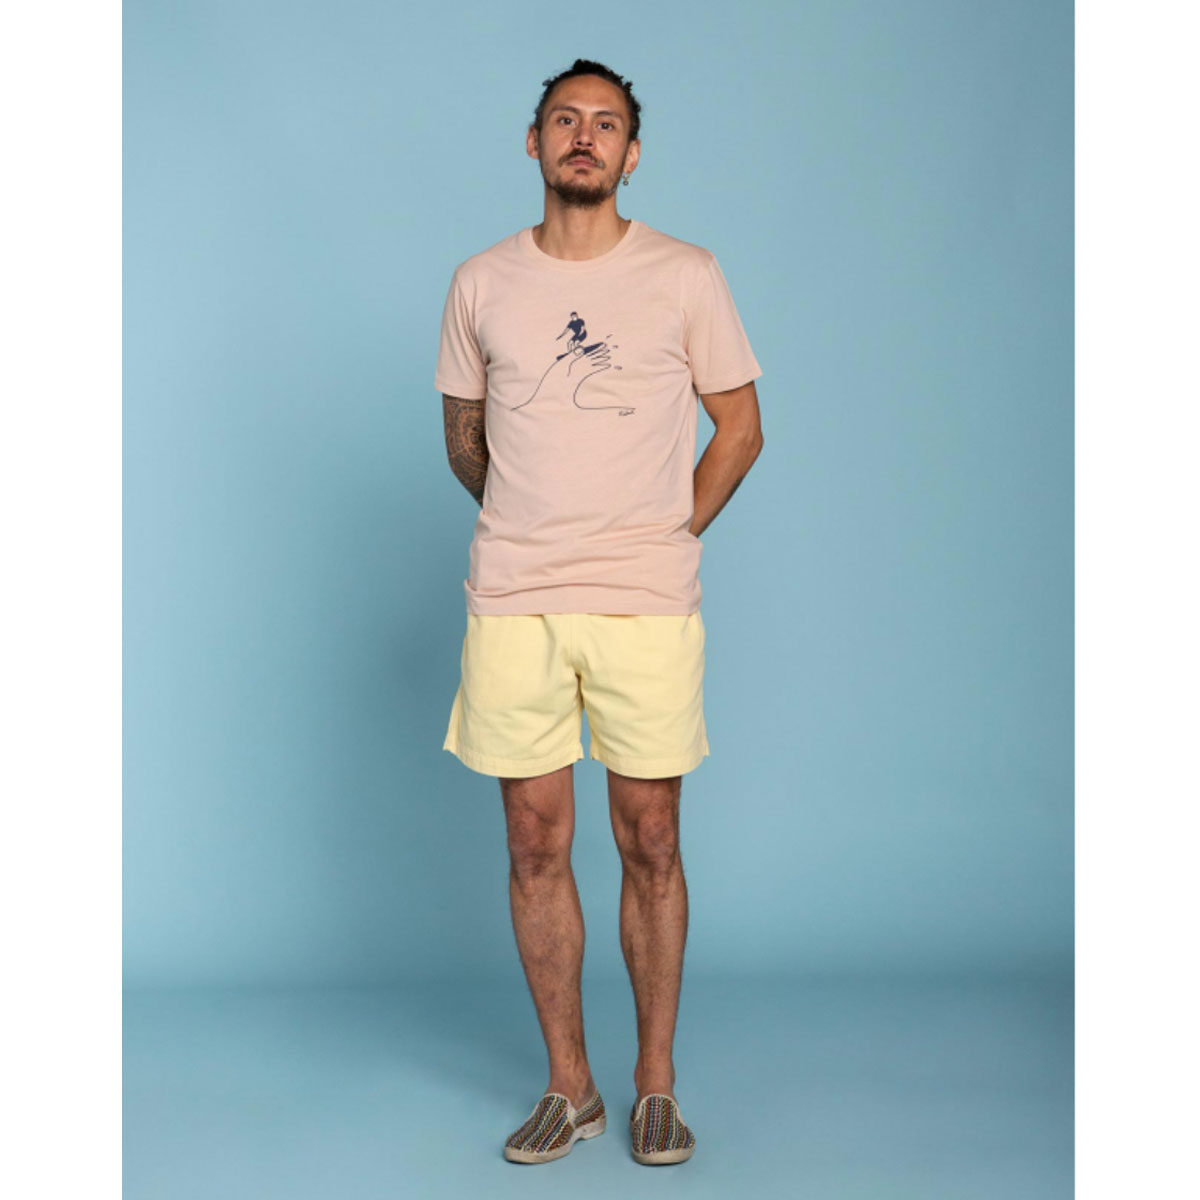 OLOW Tshirt SURF HAND Rose